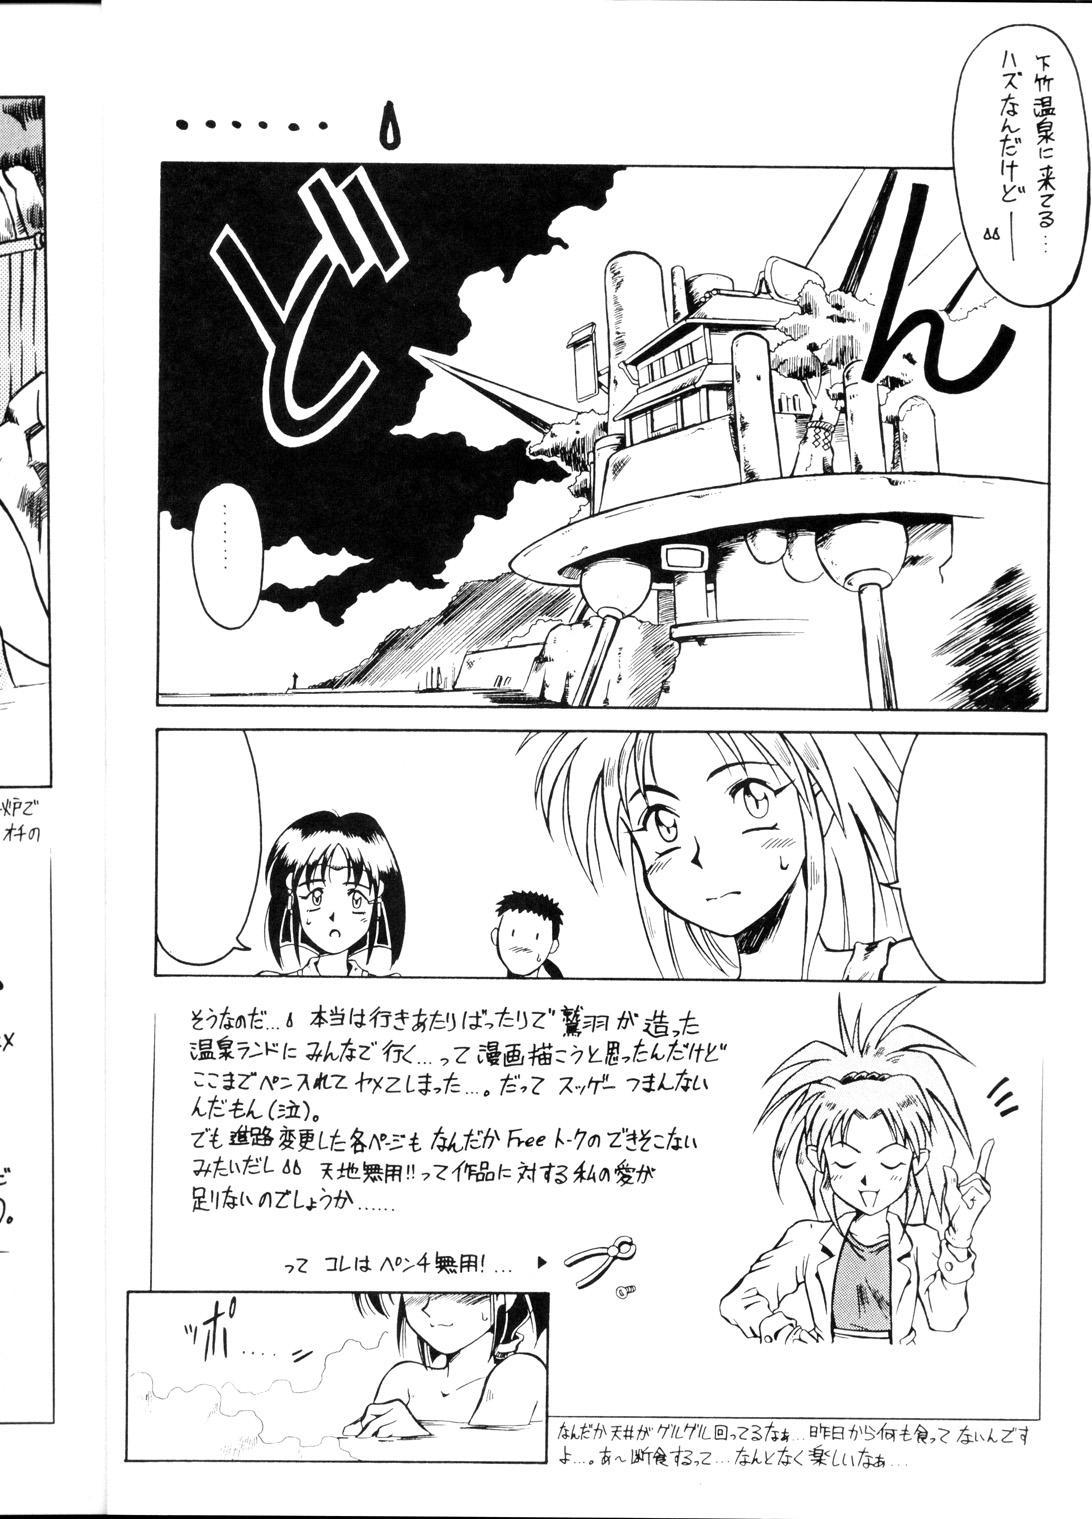 [B.B.C] Tenchi Muyou! Ryou-ou-ki Kaiteiben (Tenchi Muyou!) 8